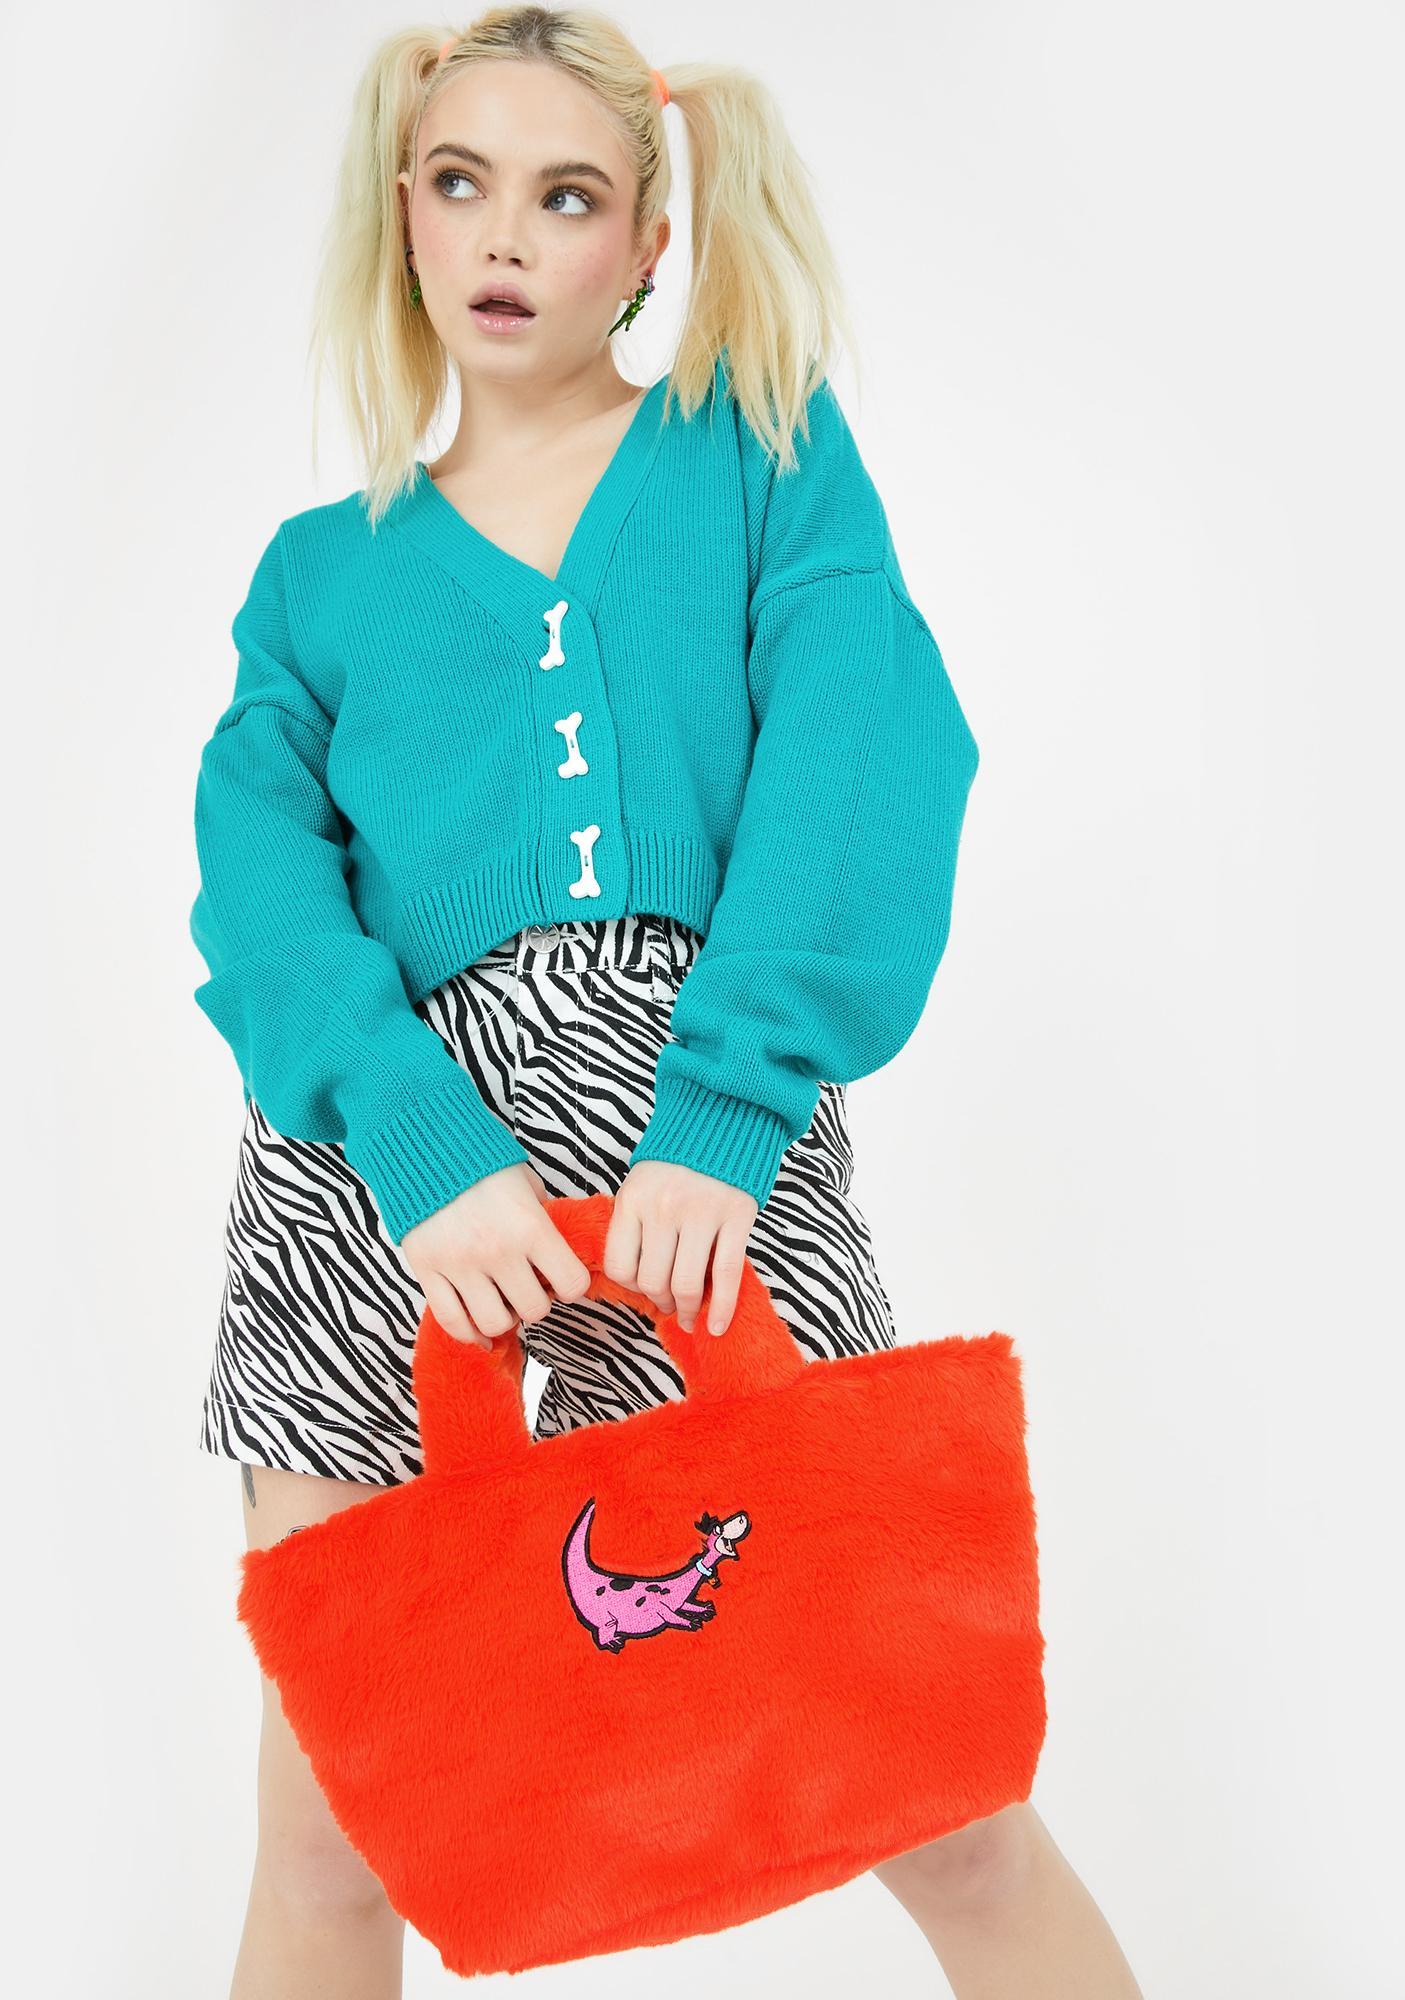 Lazy Oaf X Flintstones Furry Handbag